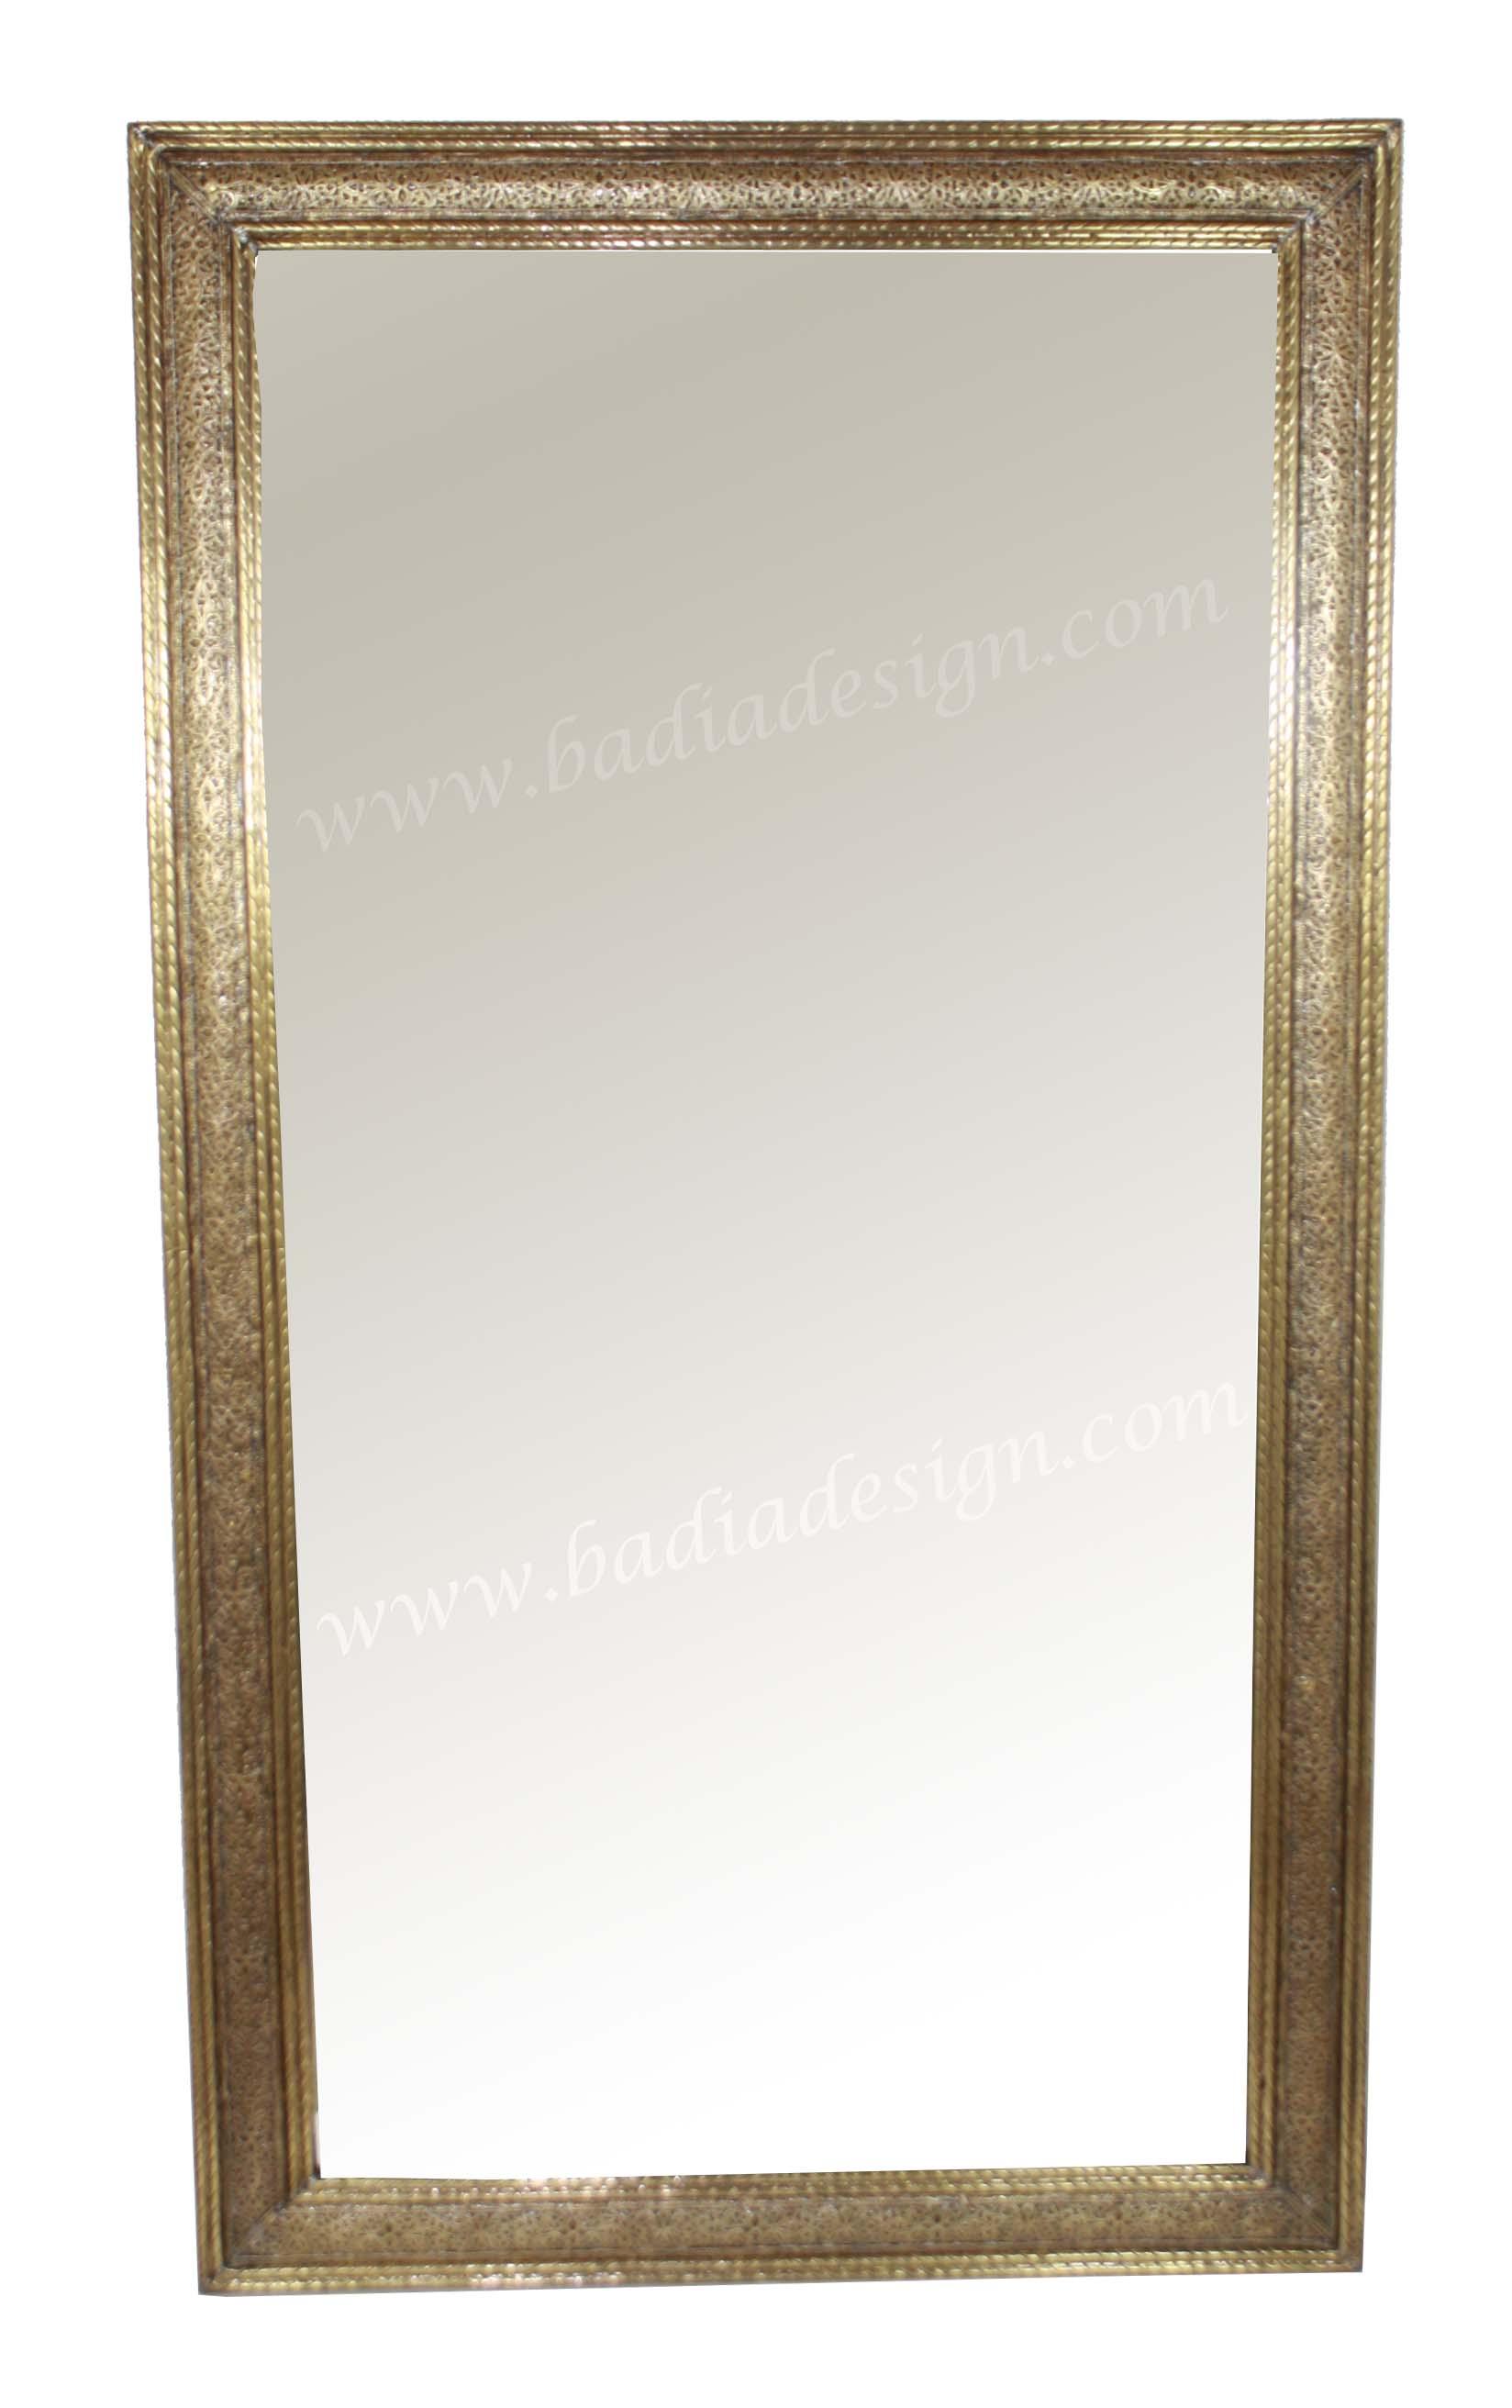 moroccan-rectangular-shaped-brass-frame-mirror-m-em005-1.jpg